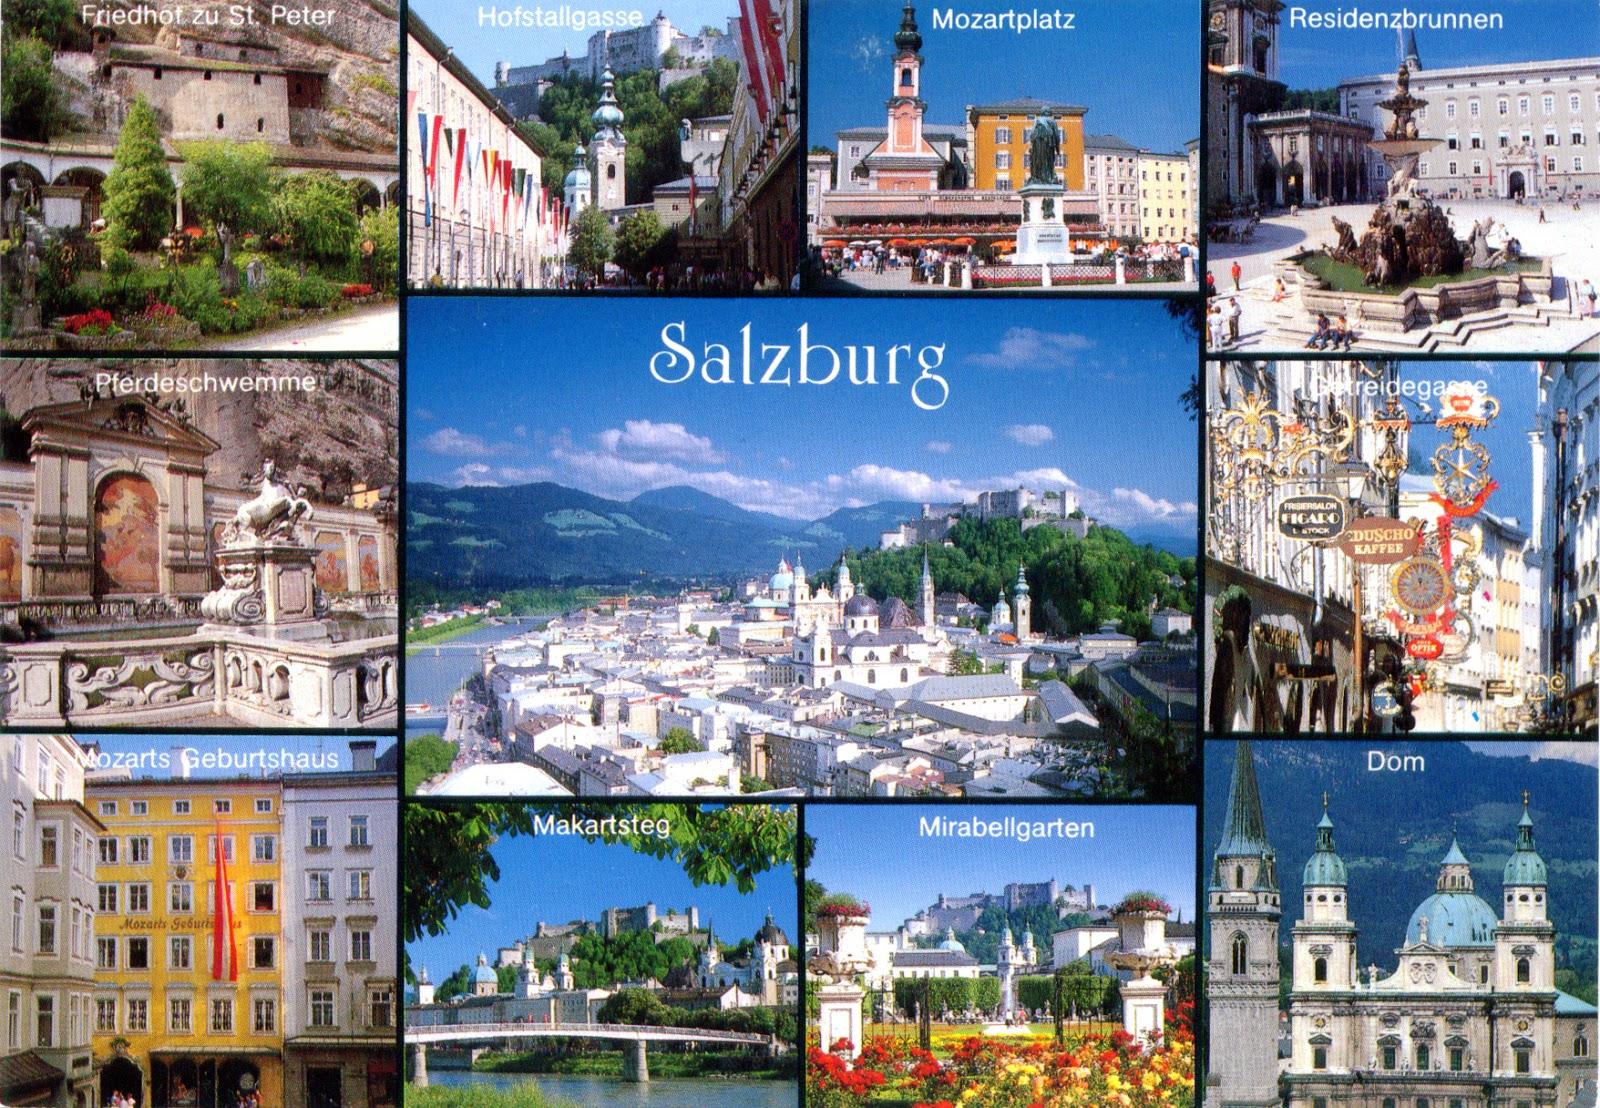 Salzburg Austria  city photos gallery : ... AUSTRIA Salzburg Historic Centre of the City of Salzburg UNESCO